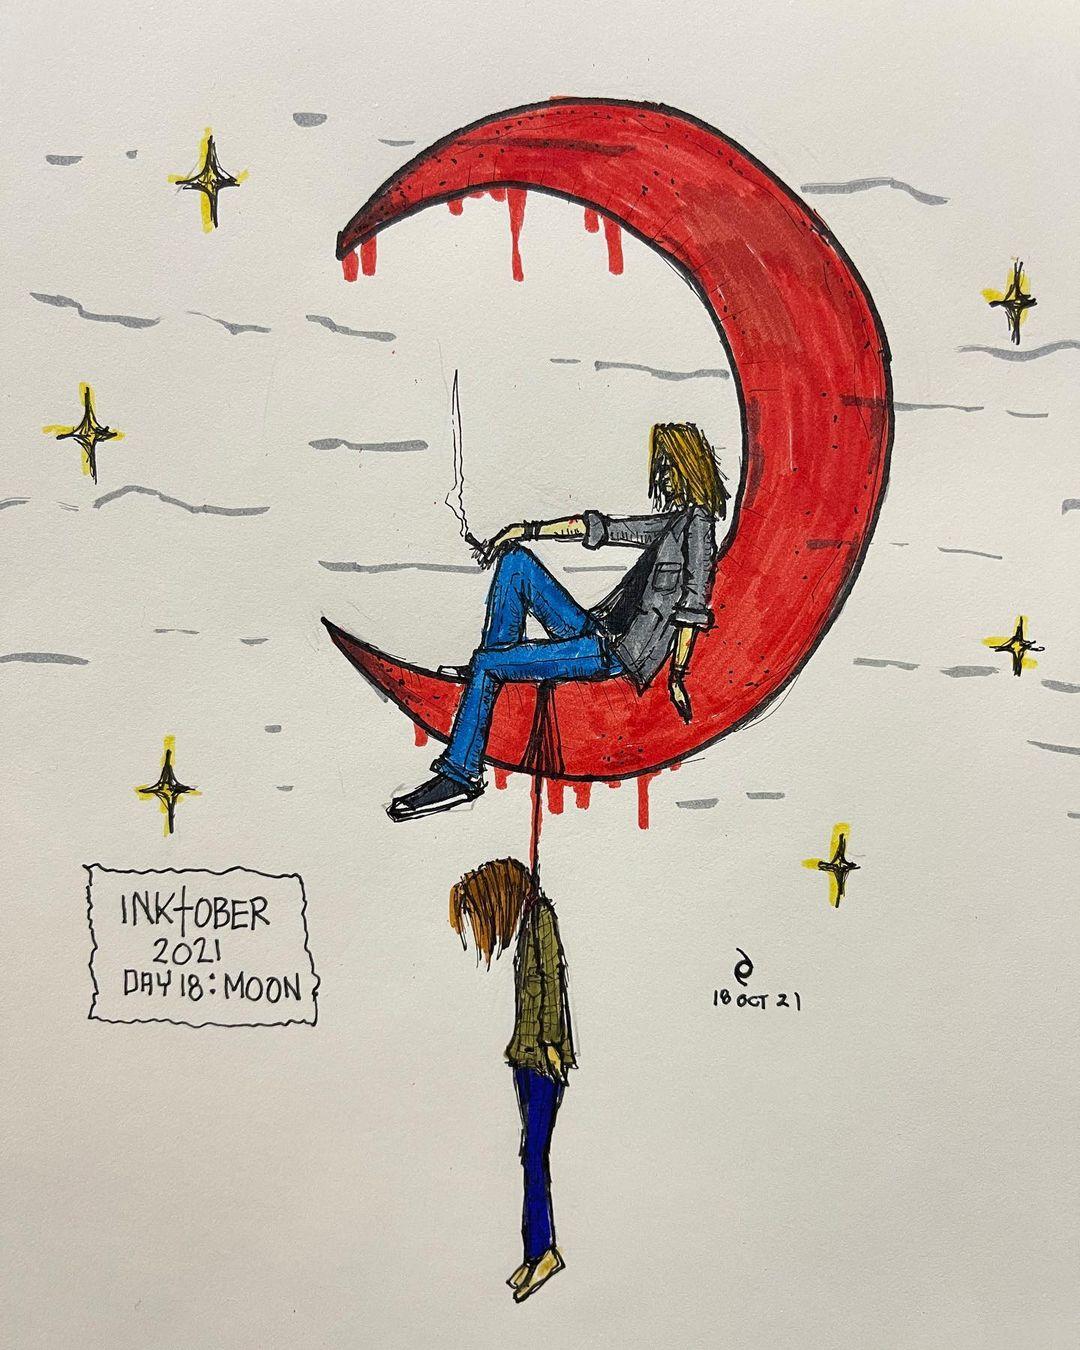 inktober - 2021 - Day 18 - Moon